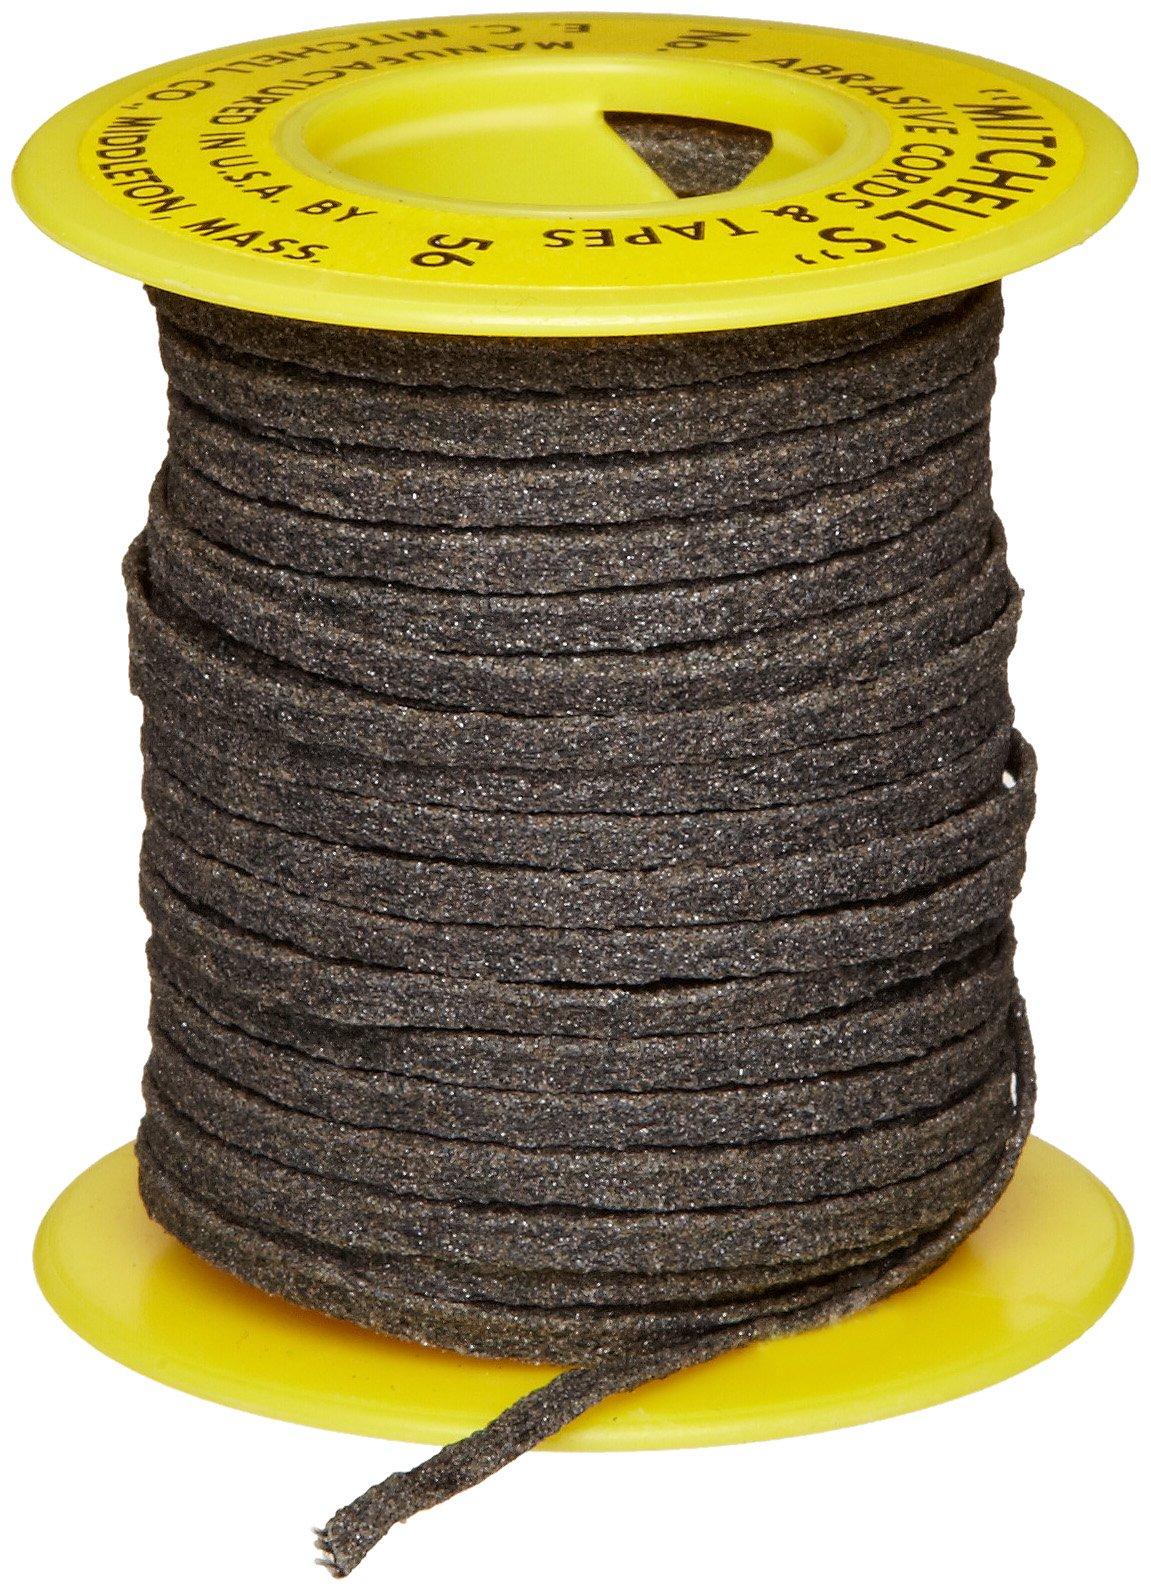 Mitchell Abrasives 56 Flat Abrasive Tape, Aluminum Oxide 150 Grit 3/32'' Wide x 50 Feet